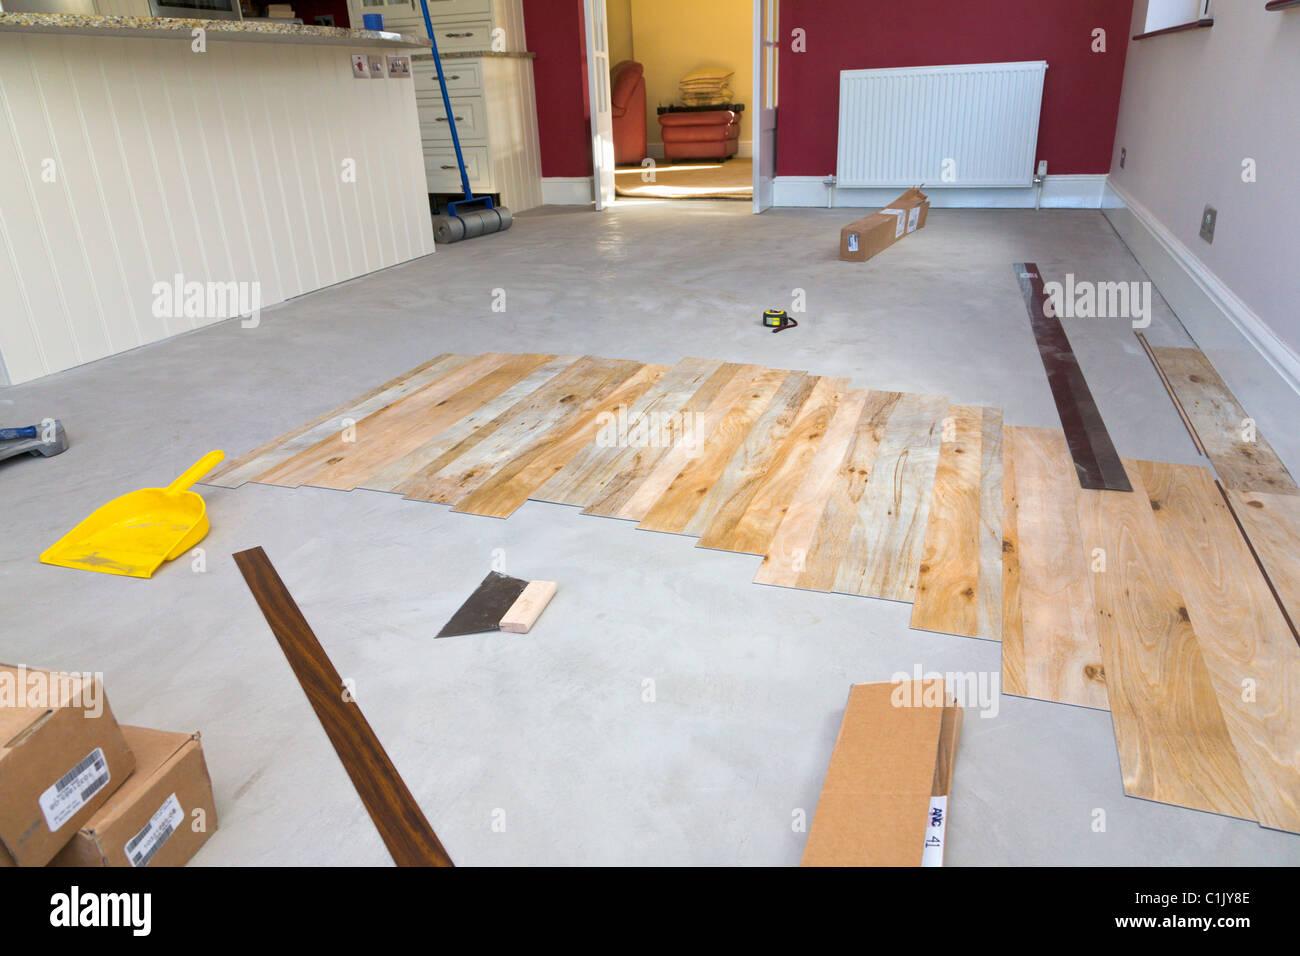 Fußbodenbelag Amtico ~ Amtico flooring stockfotos amtico flooring bilder alamy